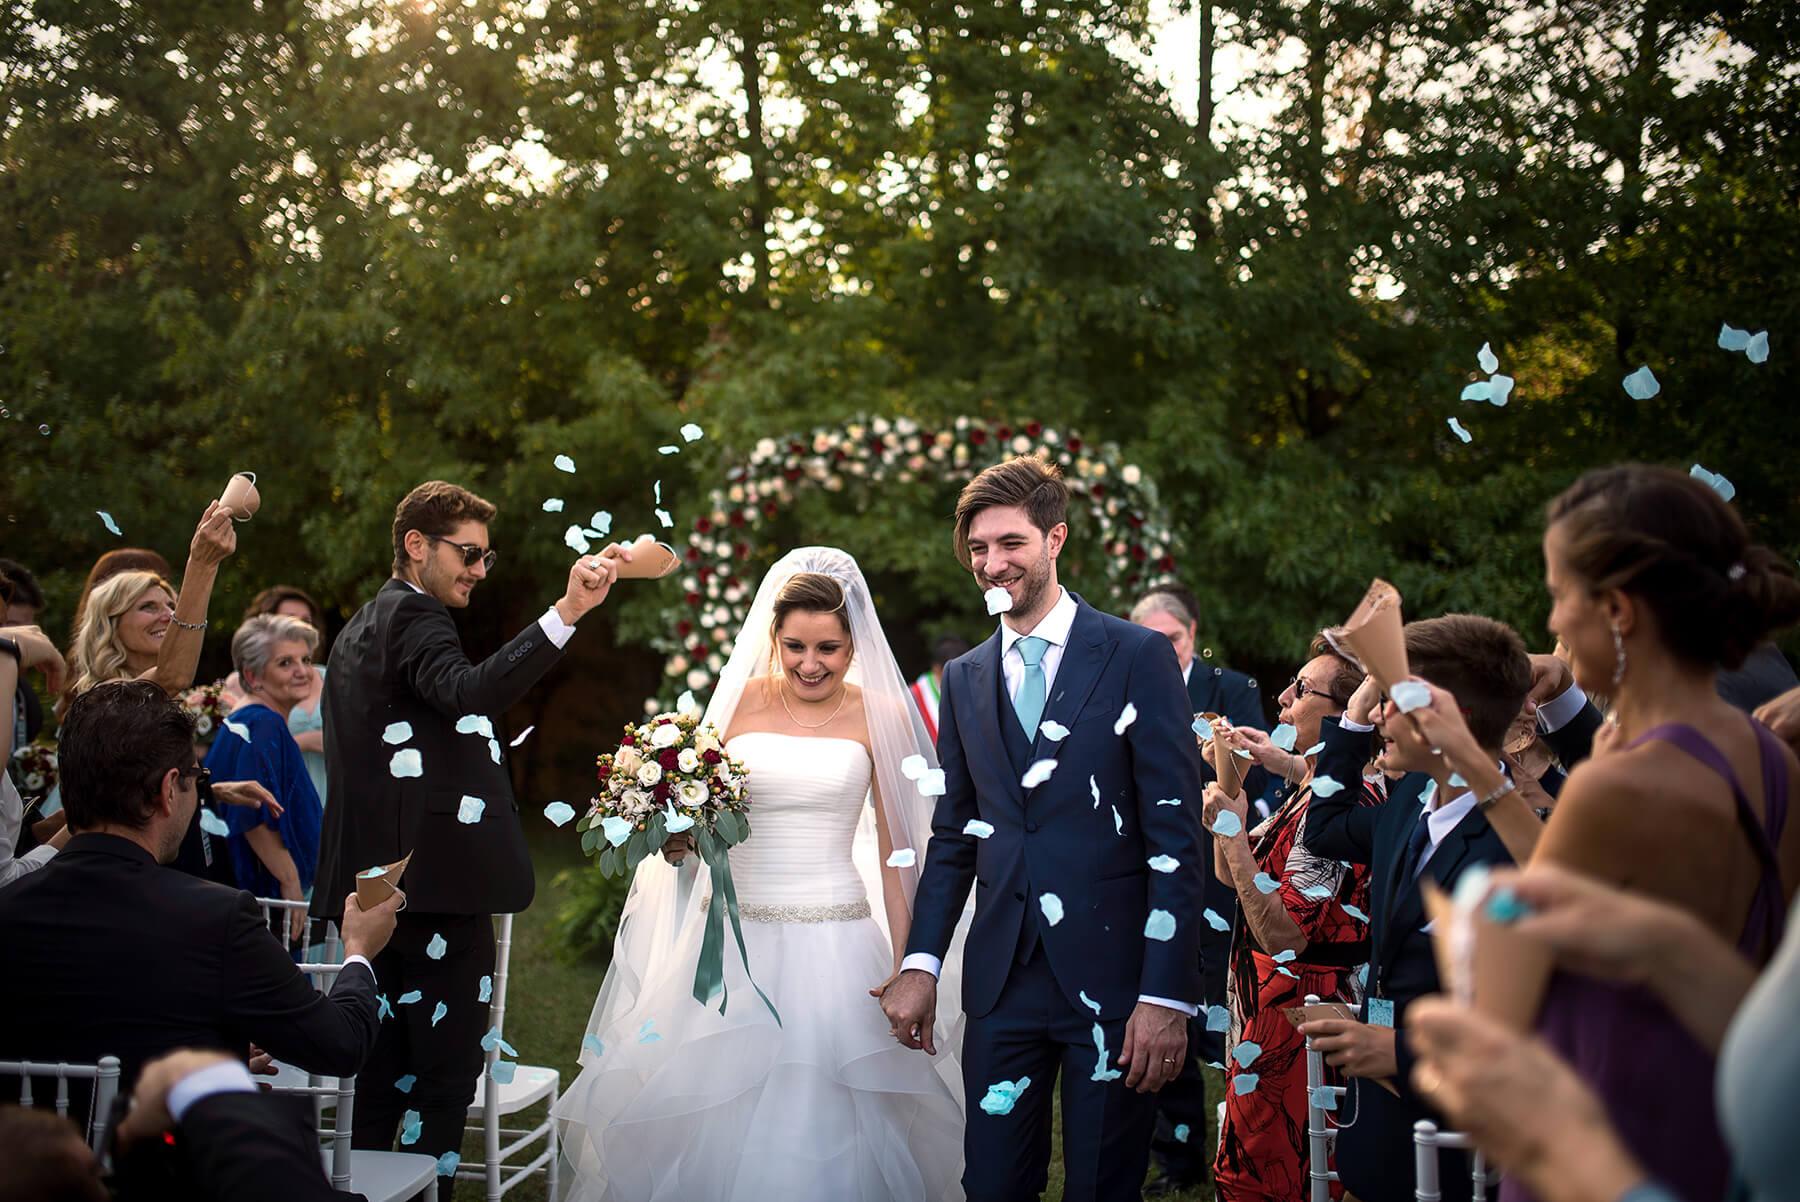 Beniamono-lai-fotografo-di matrimonio-sardegna12